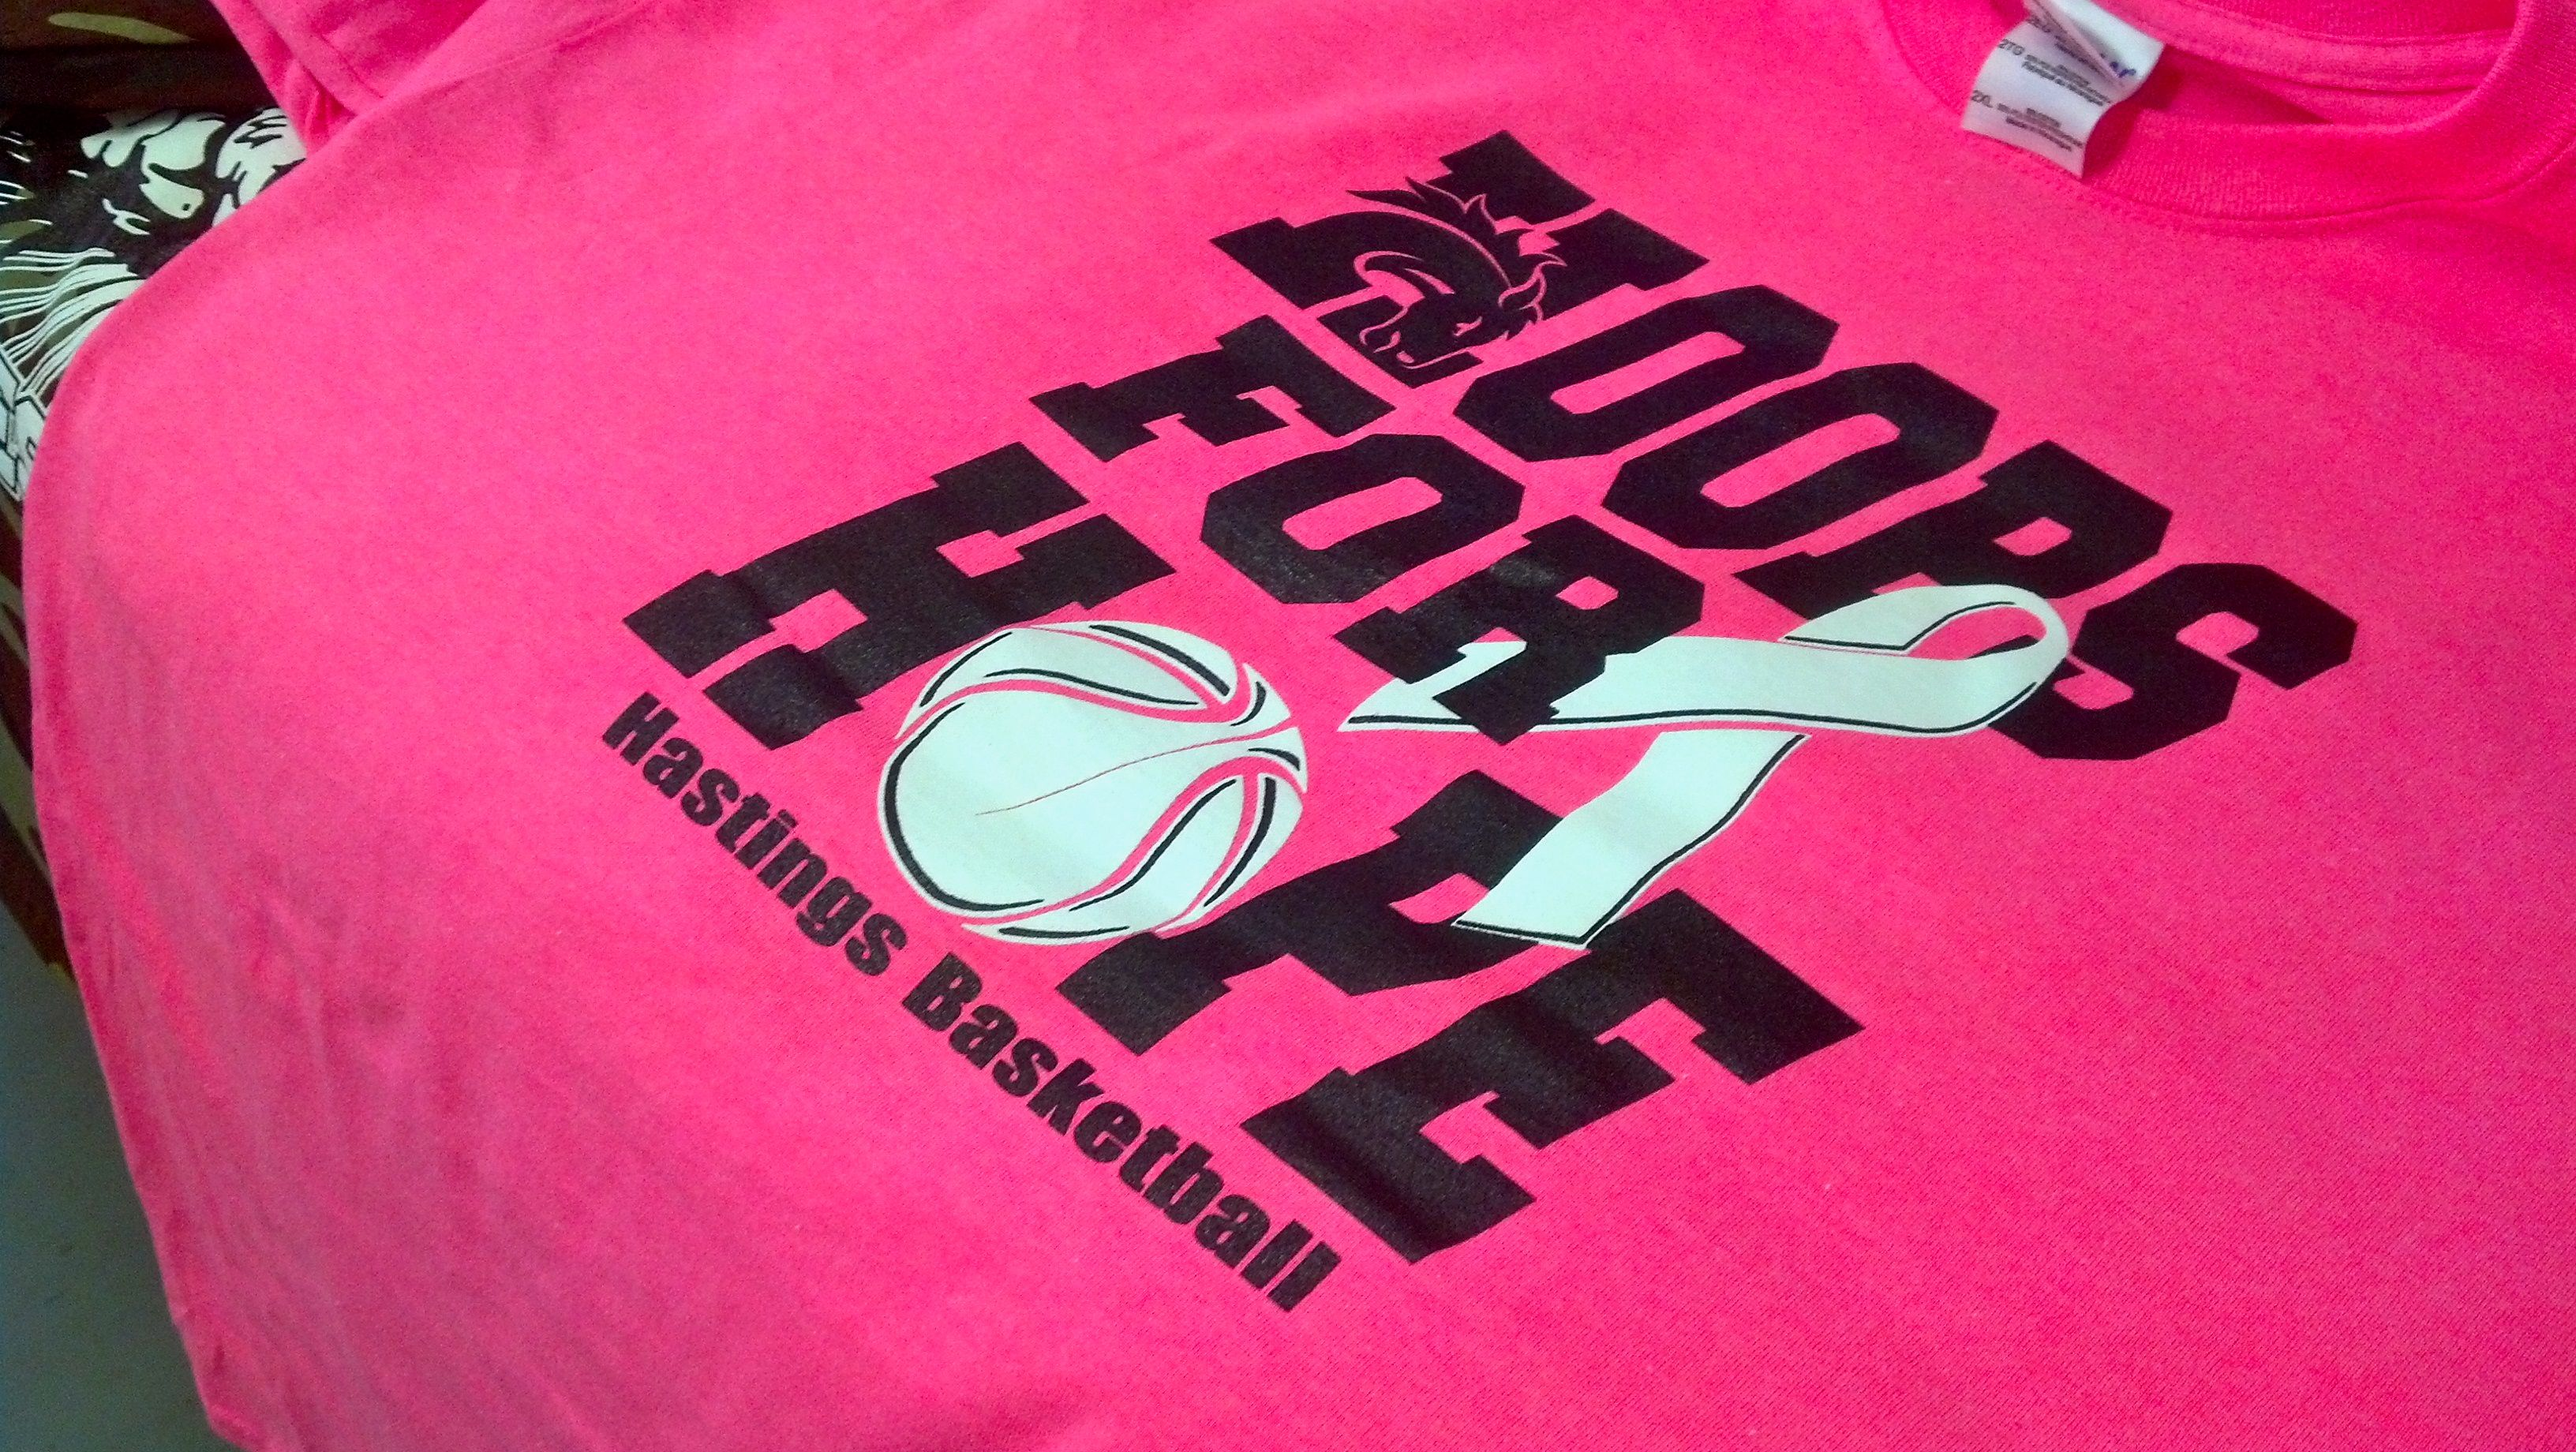 2437c283 Hoops For Hope - Hastings College Basketball - Breast Cancer Awareness -  Pink Out - t-shirt - tee shirt - screen print - screenprint - Kearney  Nebraska ...